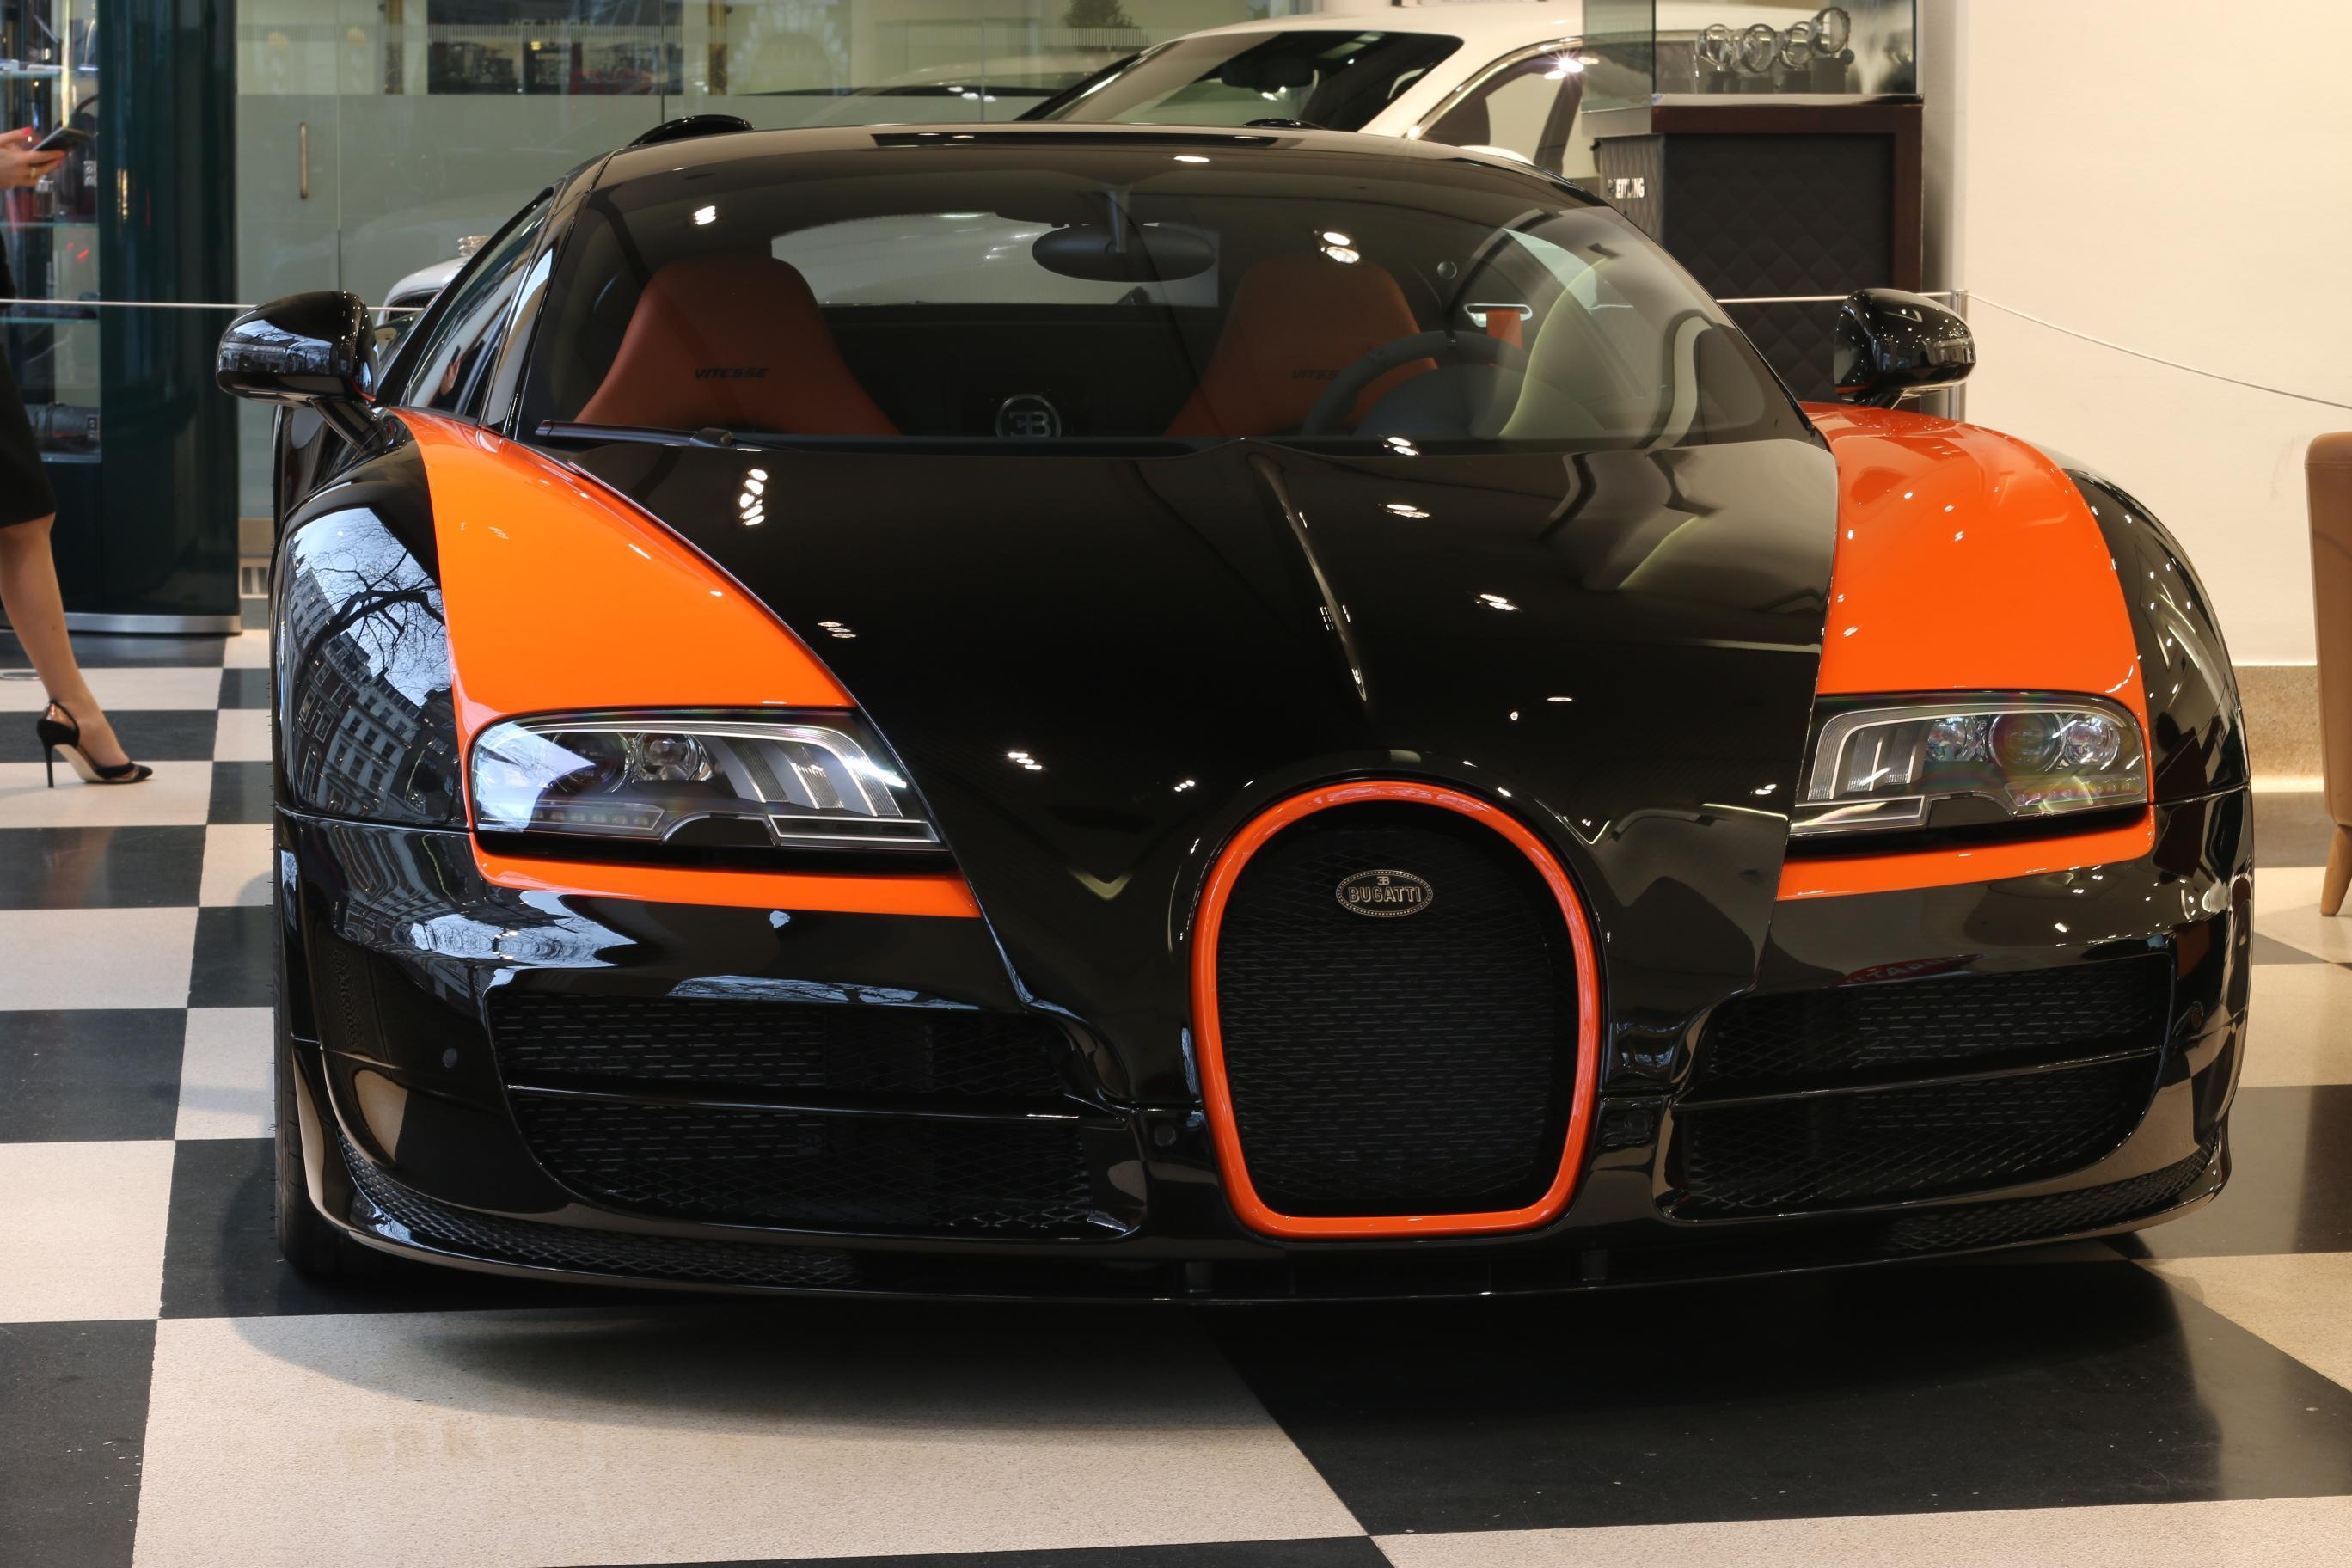 veyron-grand-sport-vitesse-wrc-8 Inspiring Bugatti Veyron Grand Sport Vitesse Wrc Cars Trend